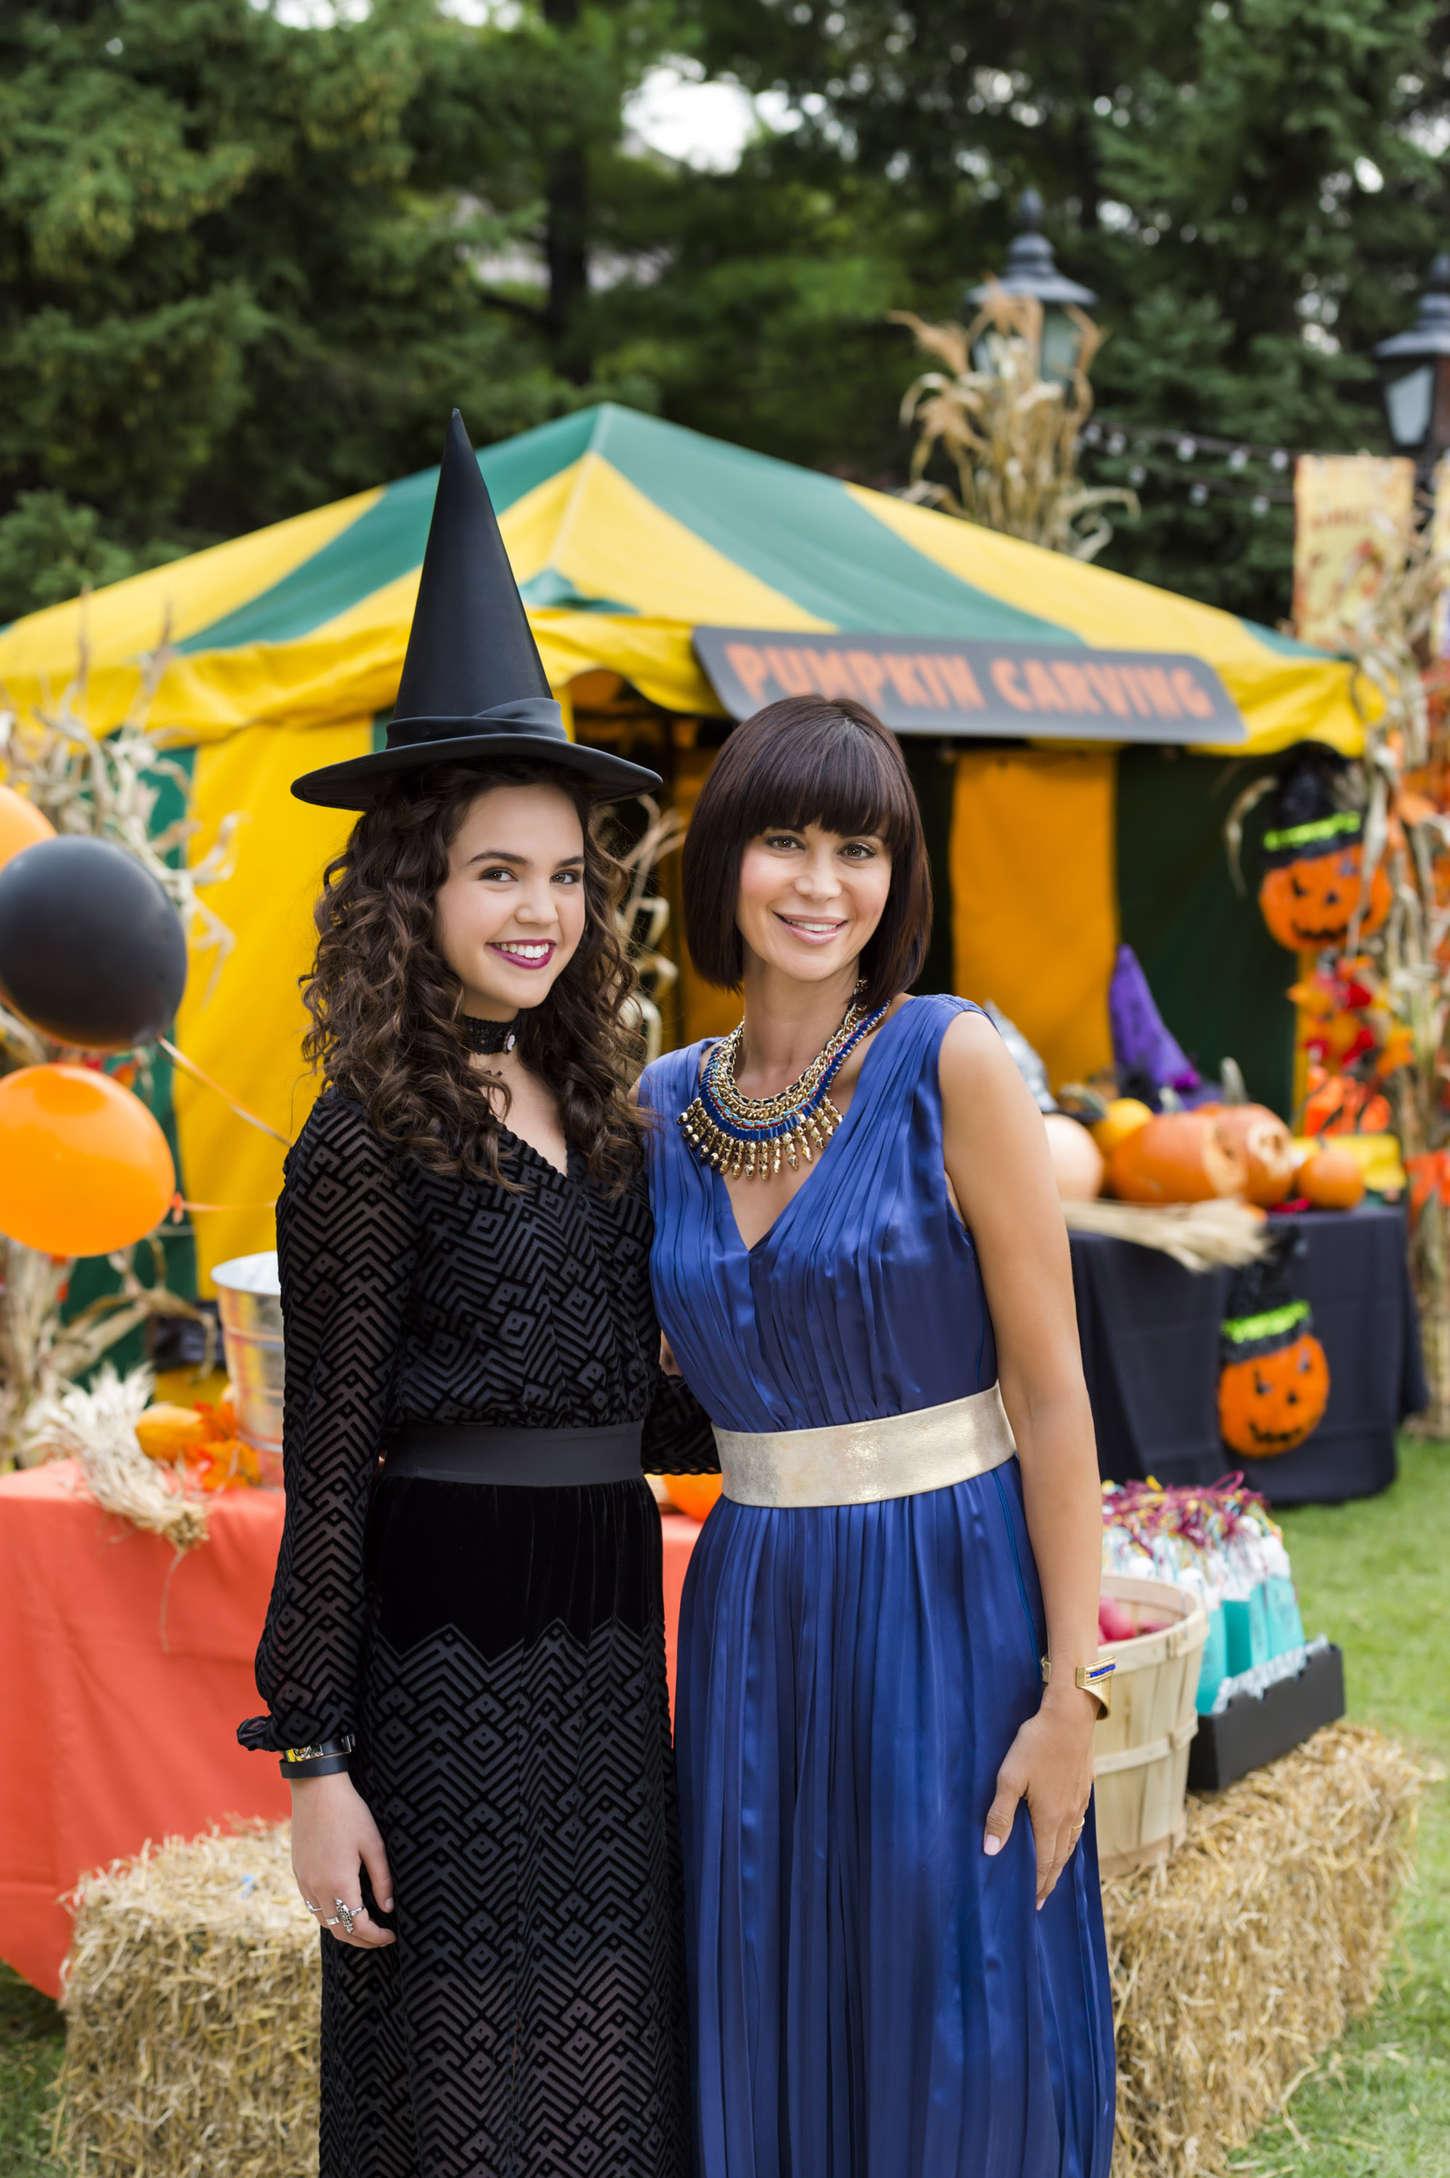 Bailee Madison 2015 : ailee Madison: Good Witch Season 2 Halloween Special Promos Stills -04